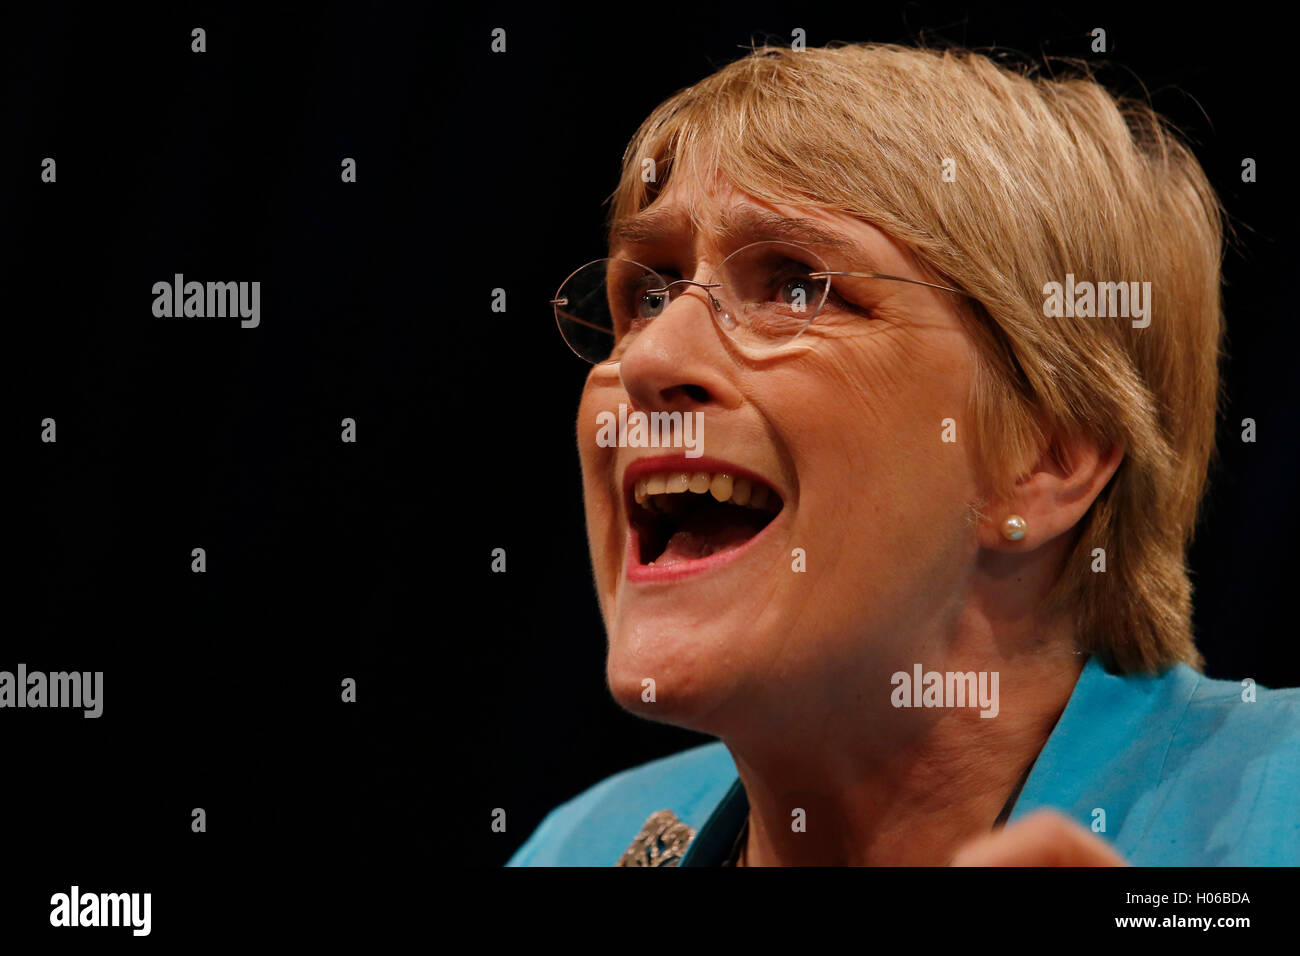 Brighton, UK. 20th Sep, 2016. Party president, Sarah Brinton, Baroness Brinton, known as Sal Brinton speaks during - Stock Image